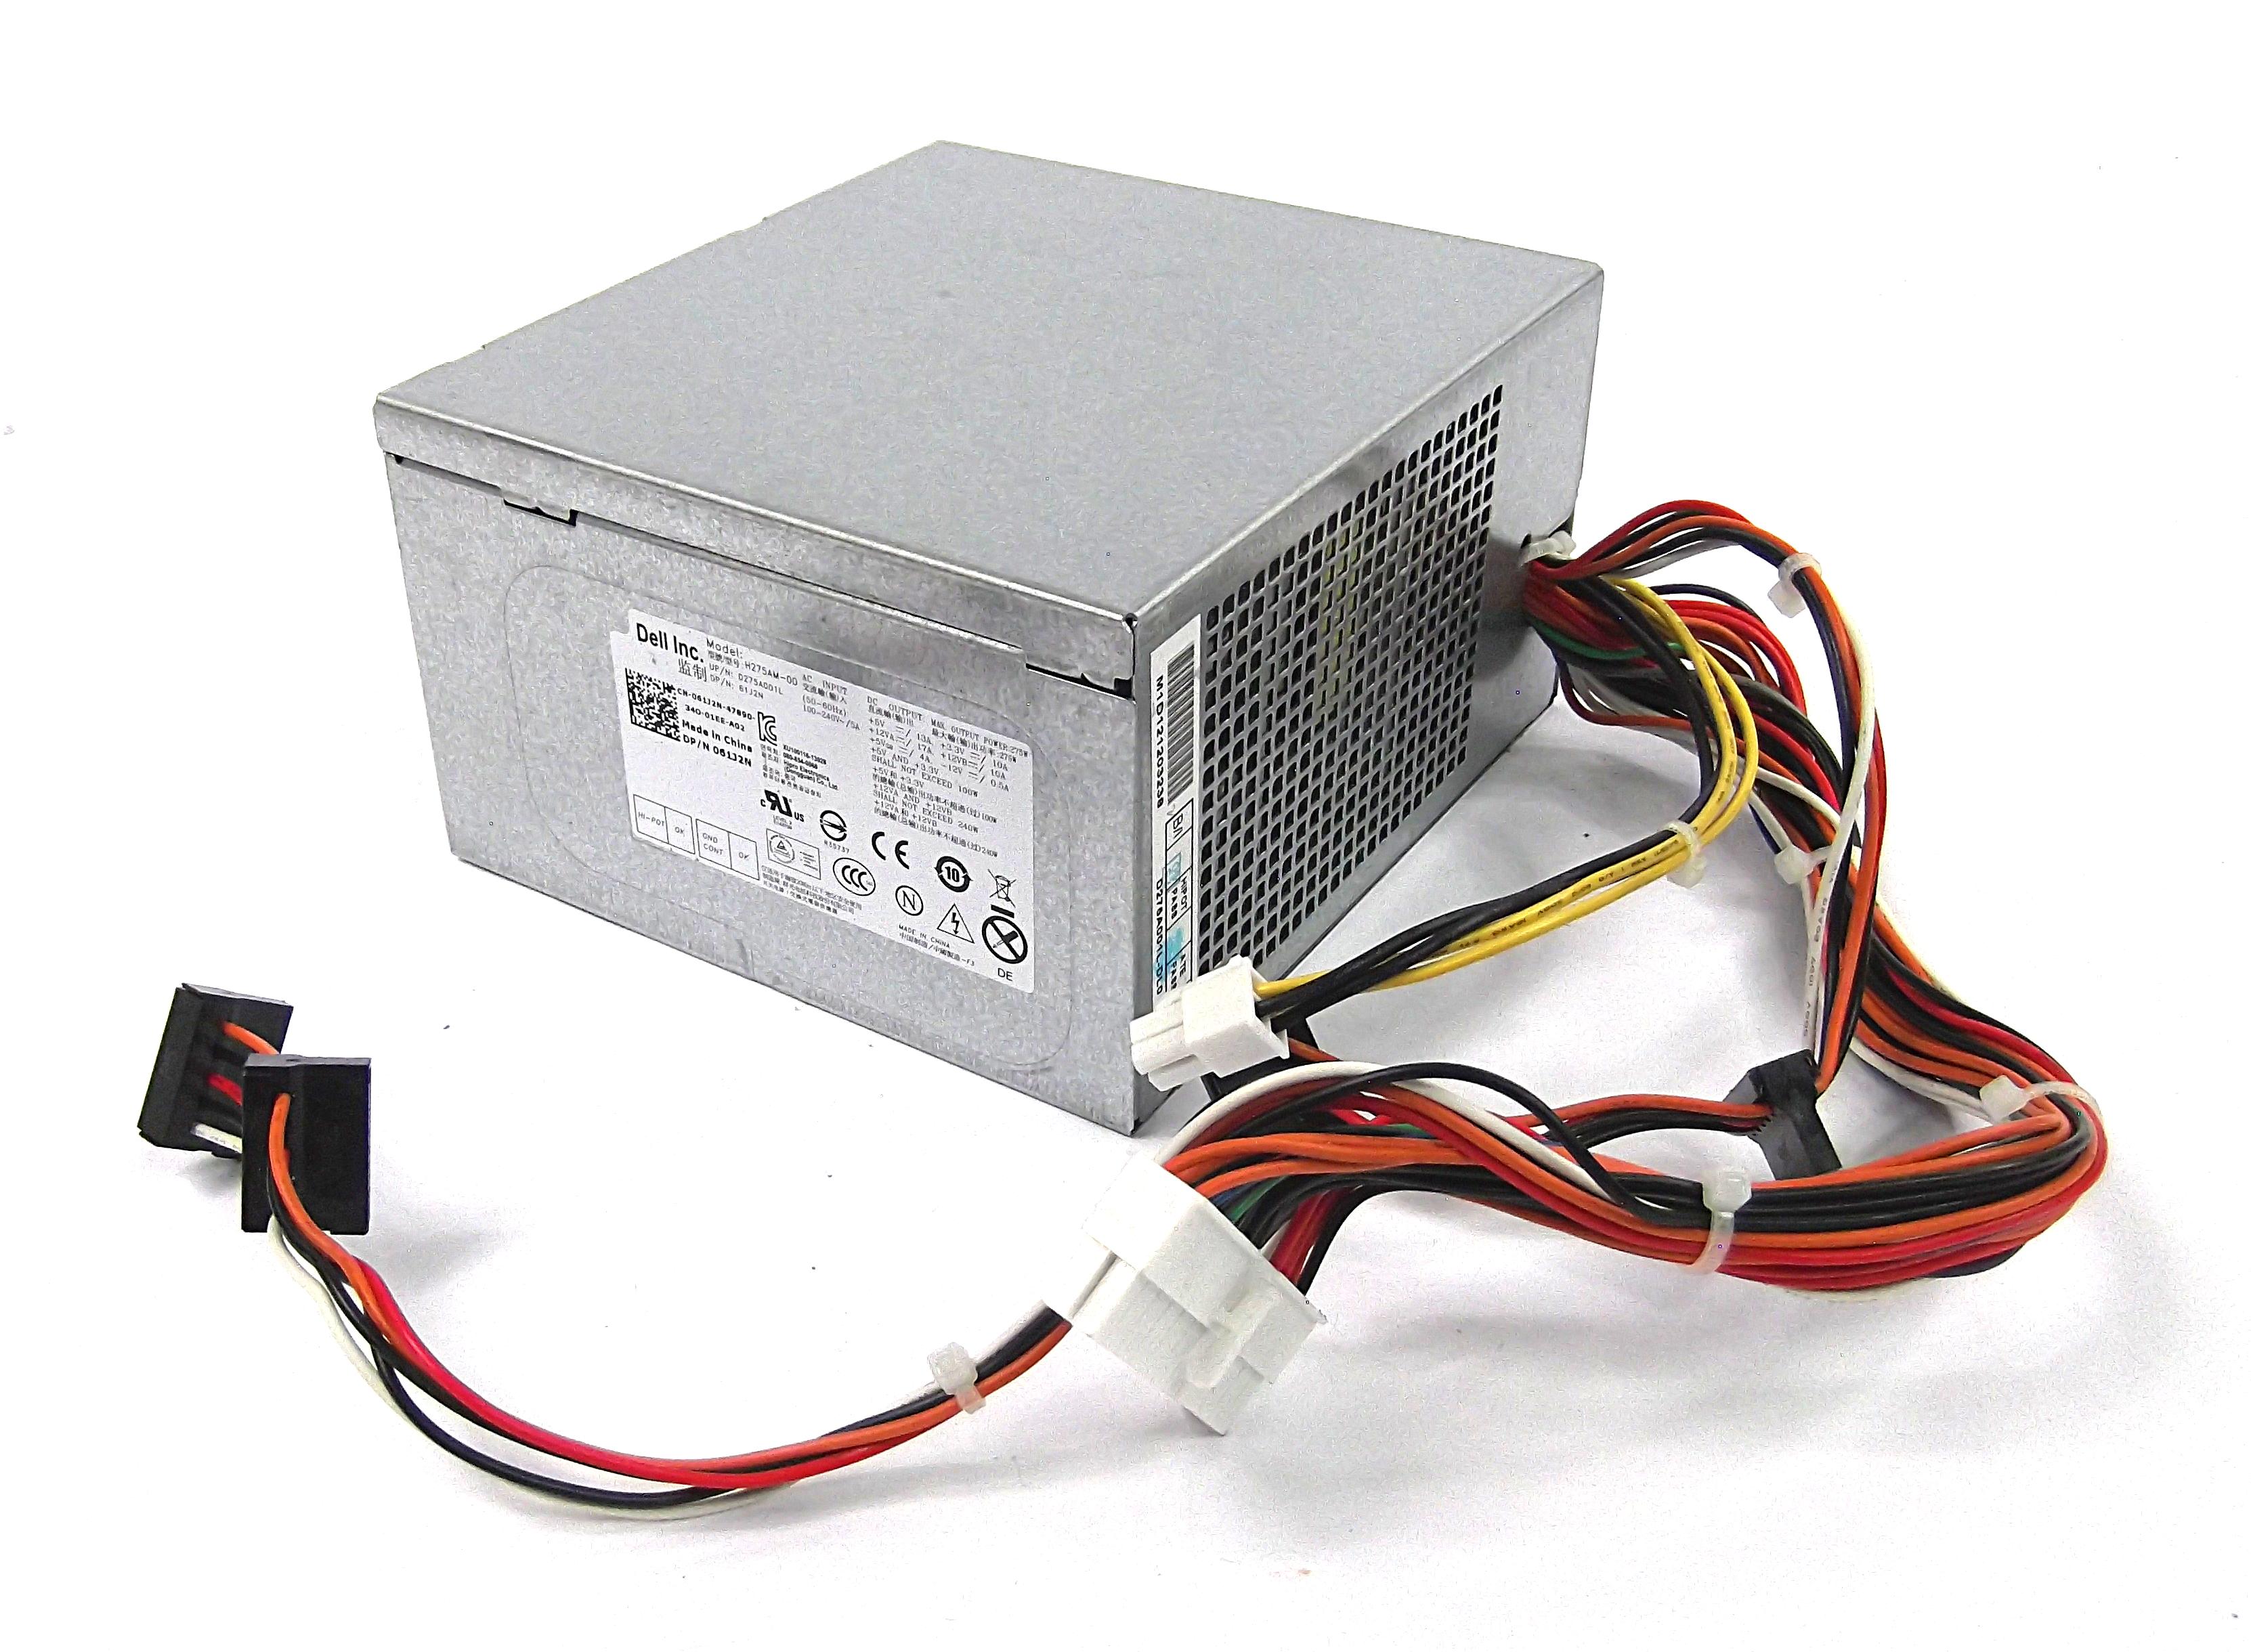 Dell 61J2N Optiplex 7010 MT 275W 24 Pin Power Supply - H275AM-00